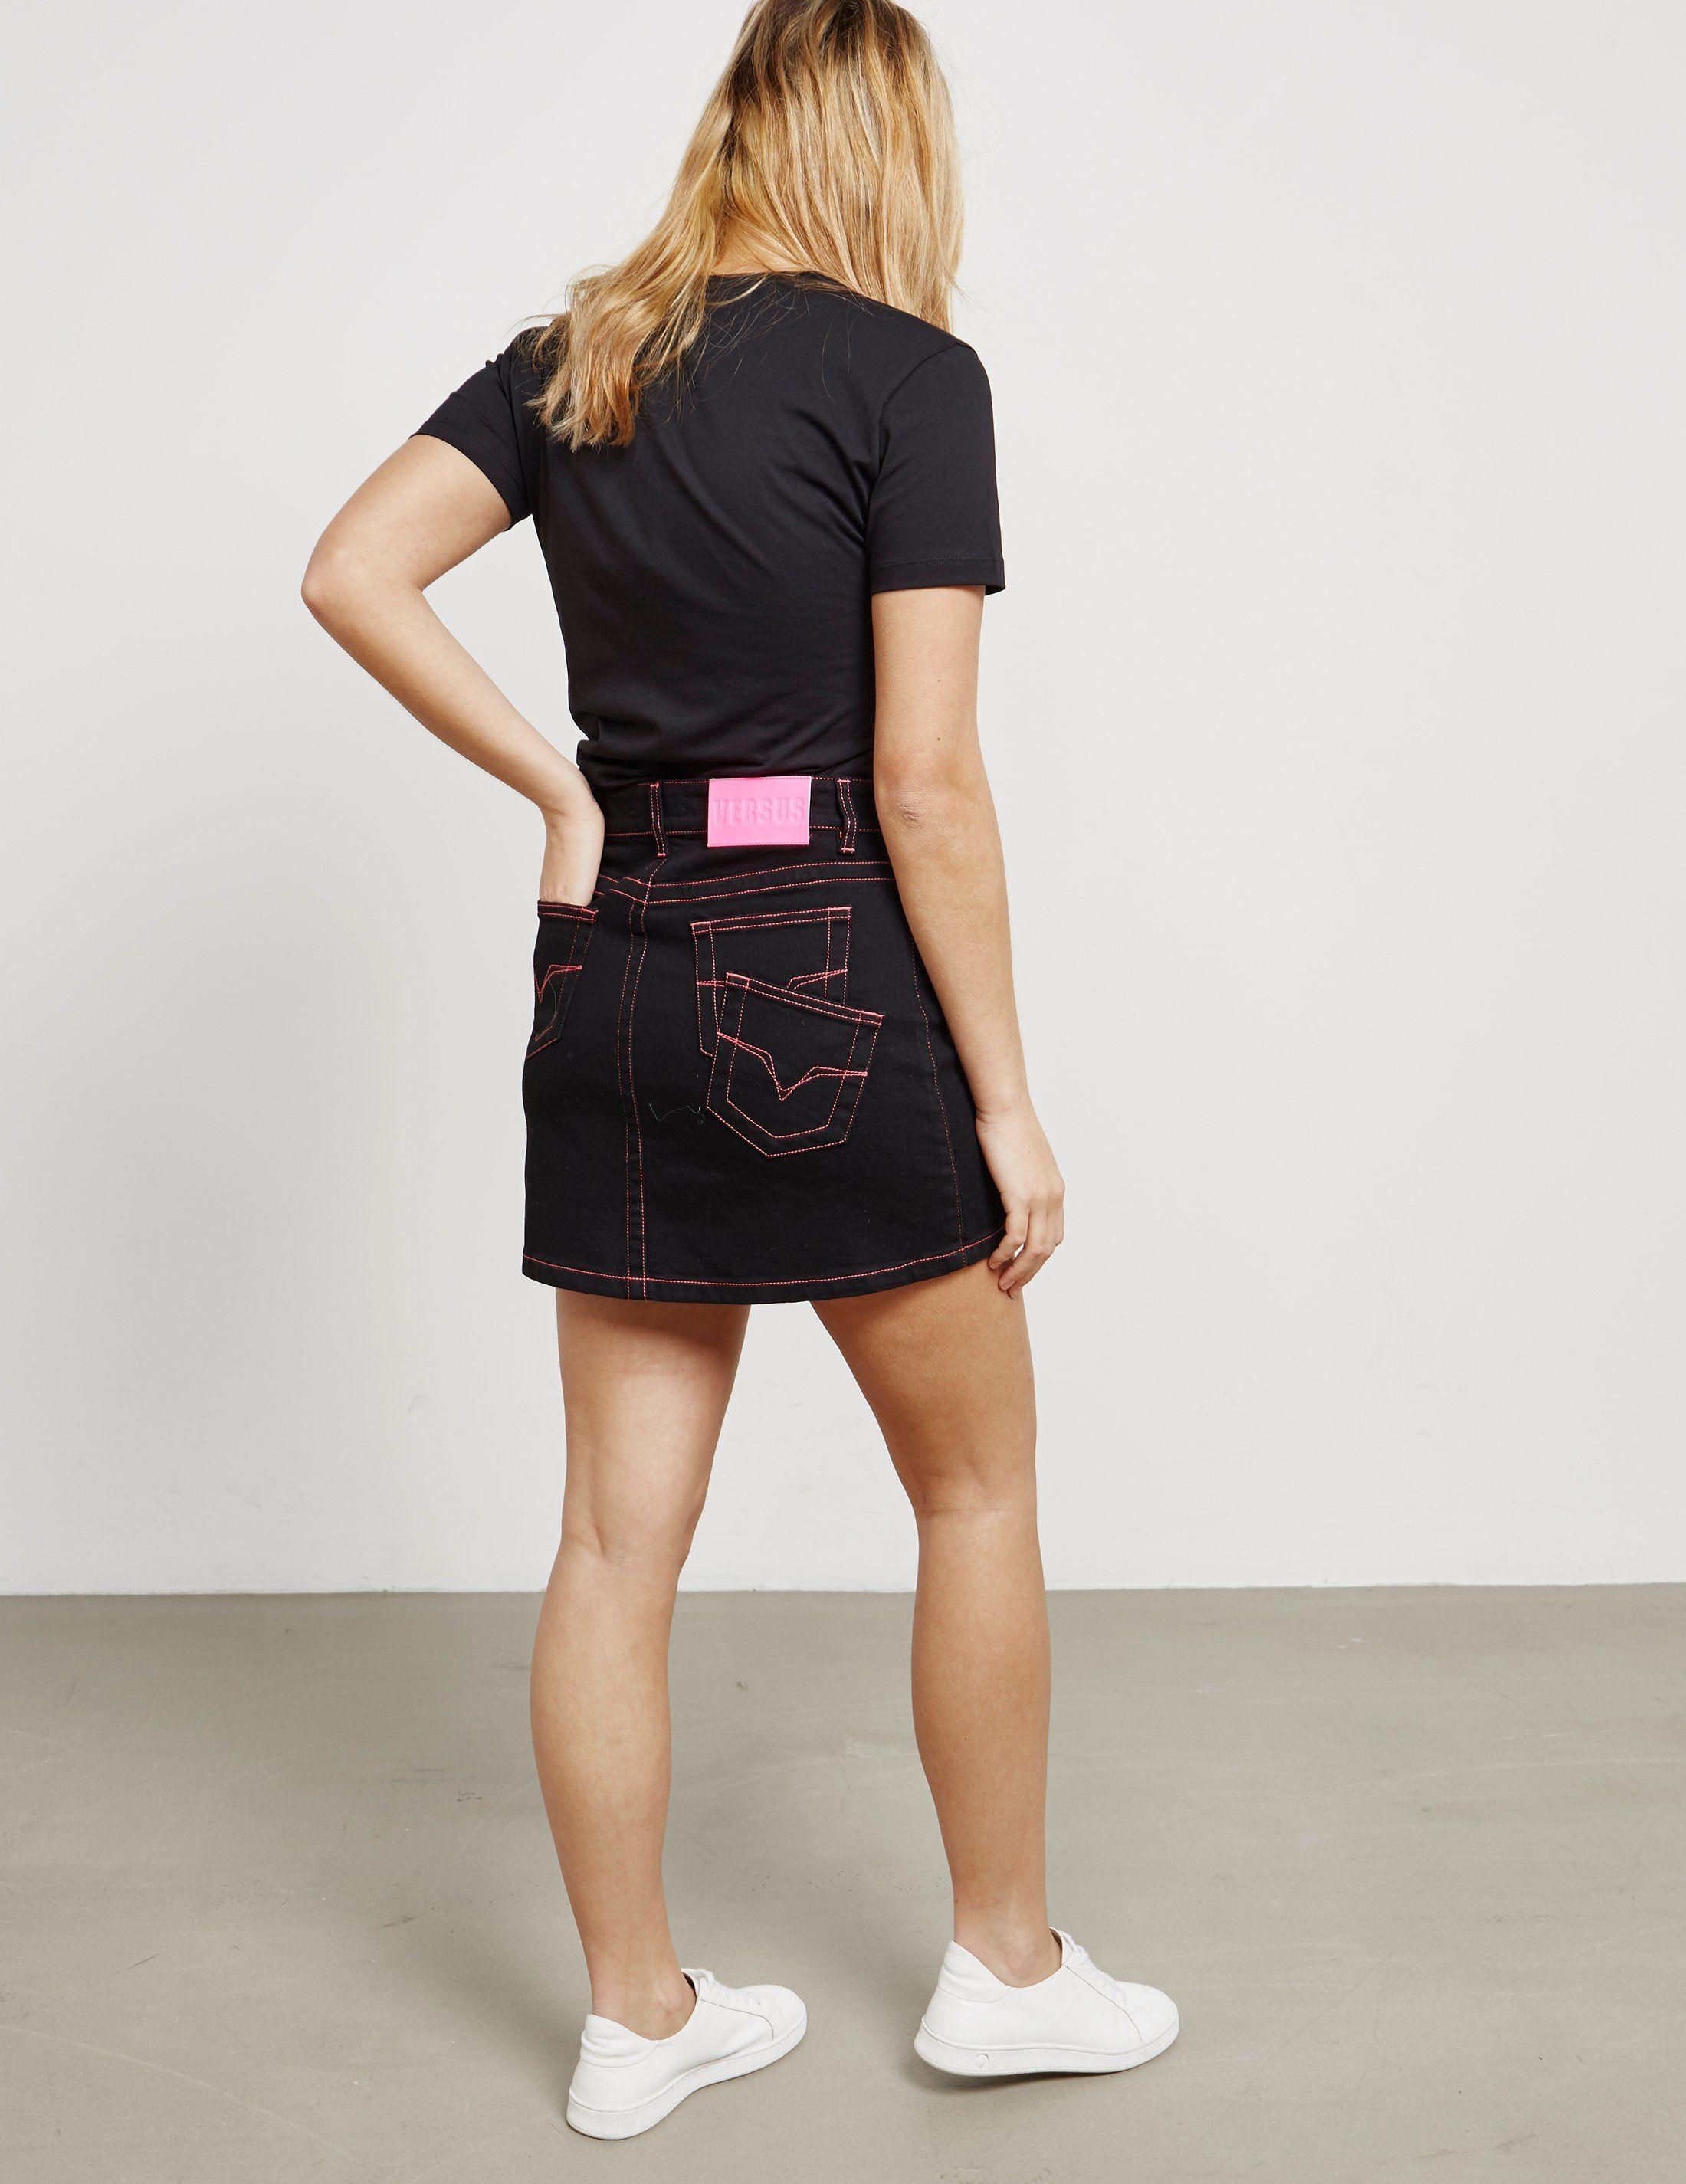 Versus Versace Denim Mini Skirt